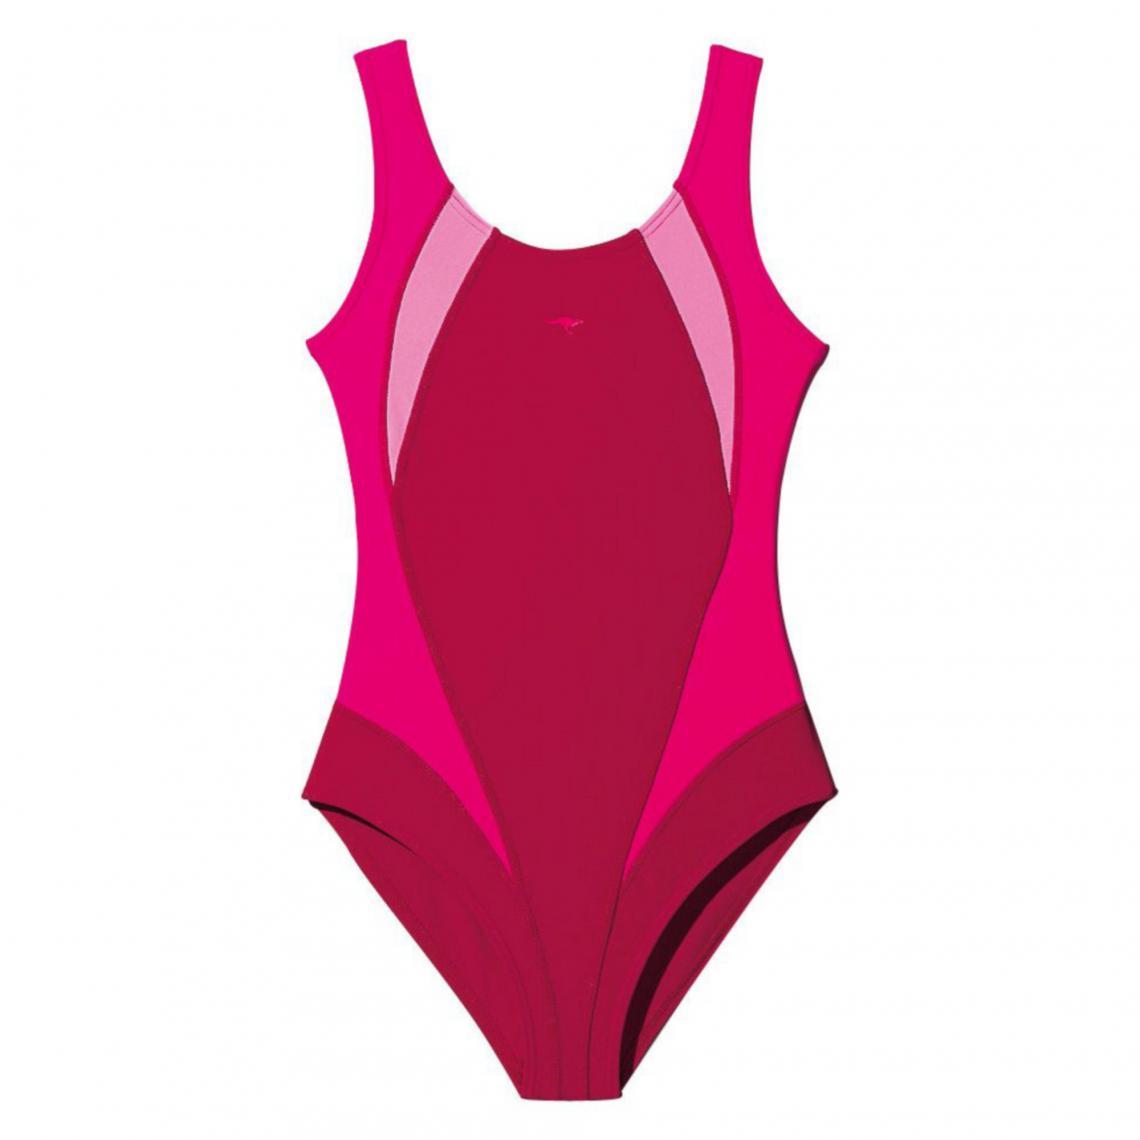 ed0d75f219 Maillot de bain natation 1 pièce fille Kangaroos - Rose KangaROOS Enfant